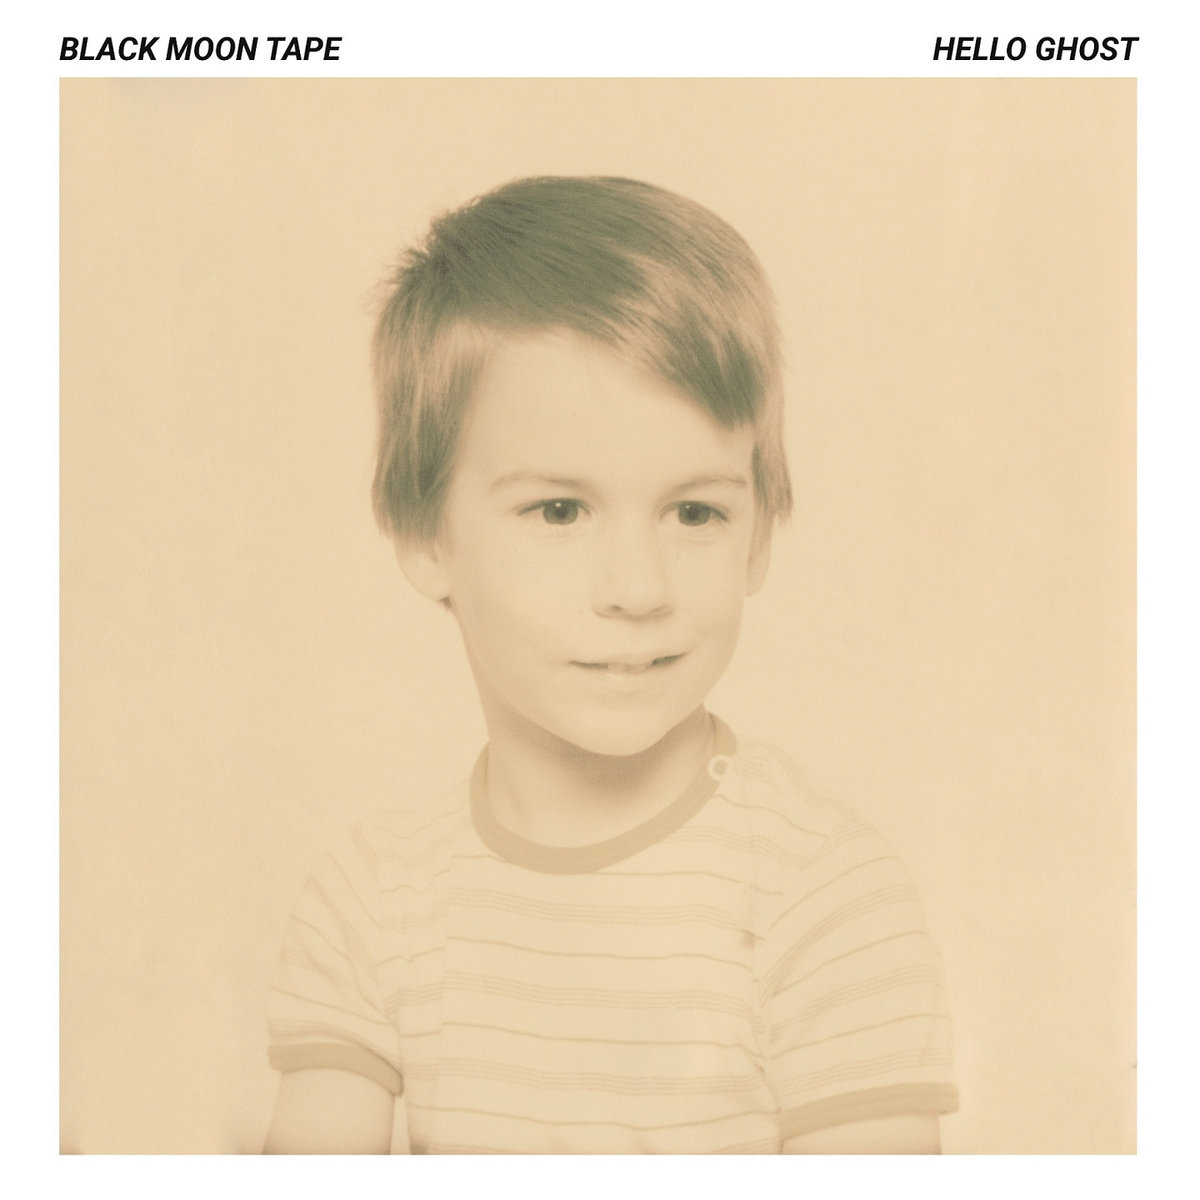 Black Moon Tape - Hello Ghost